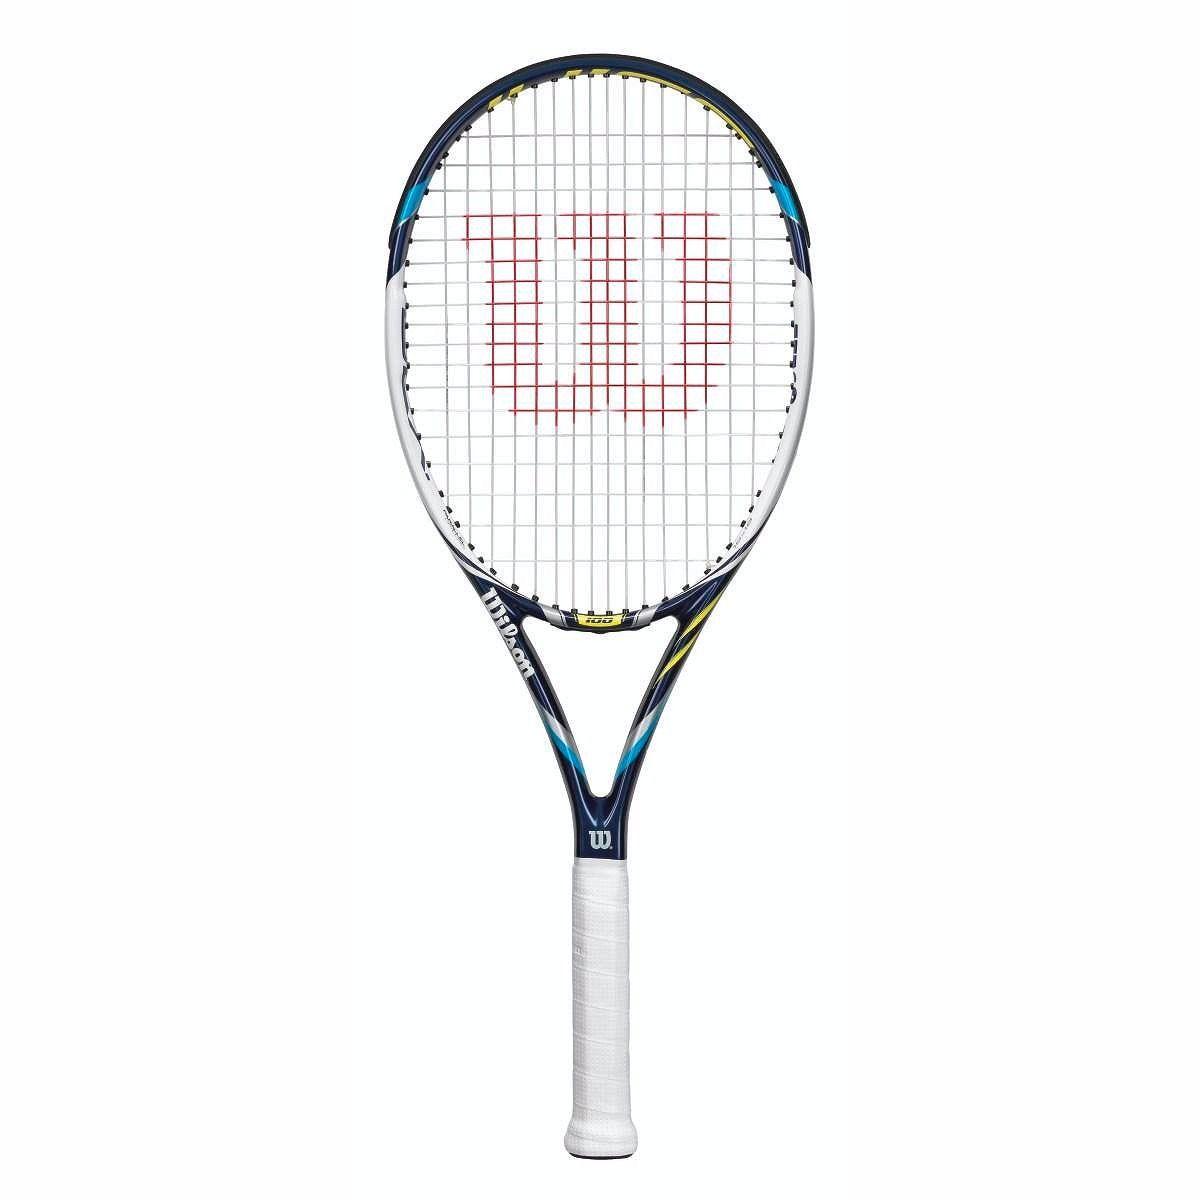 Raquete de Tênis Wilson Juice 100  - REAL ESPORTE